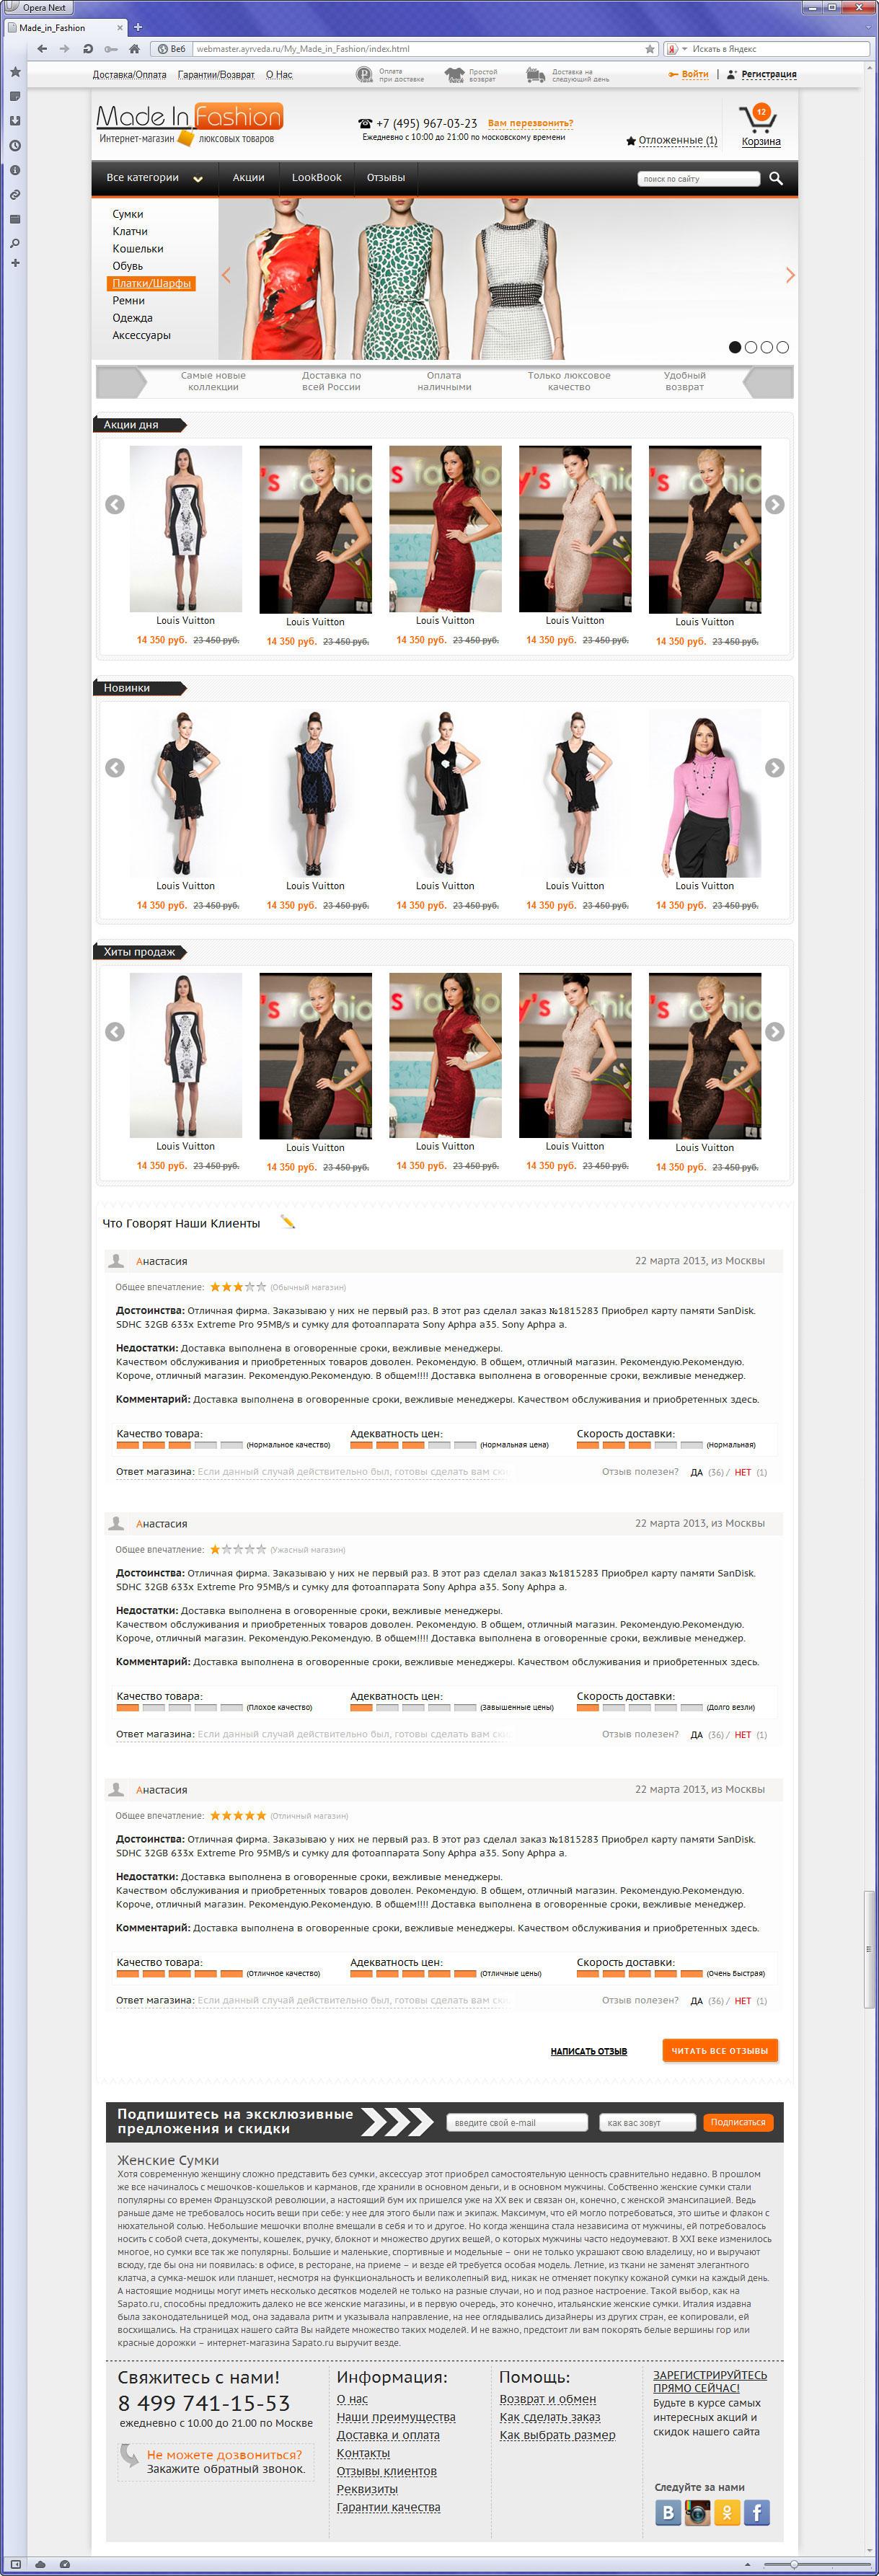 Made in Fashion (Каталог интернет магазина люксовых товаров)